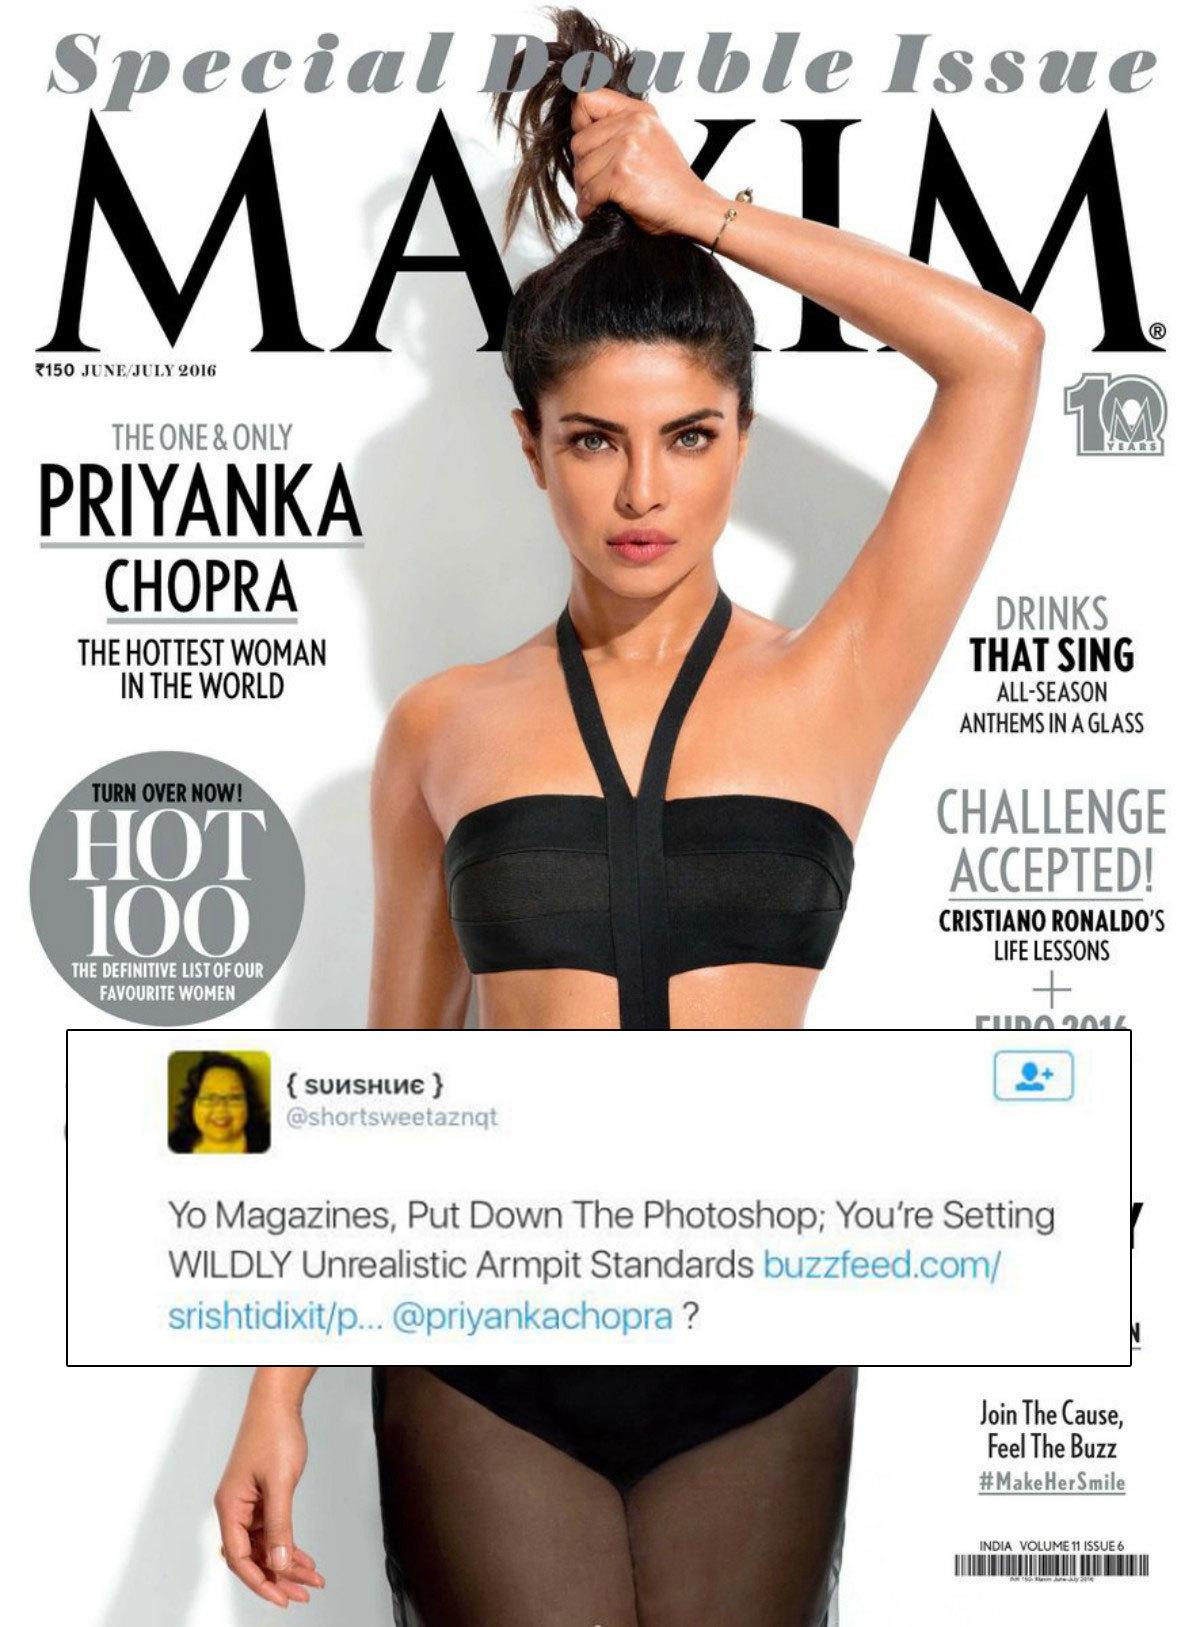 Priyanka's photoshopped armpits creating a furor among fans